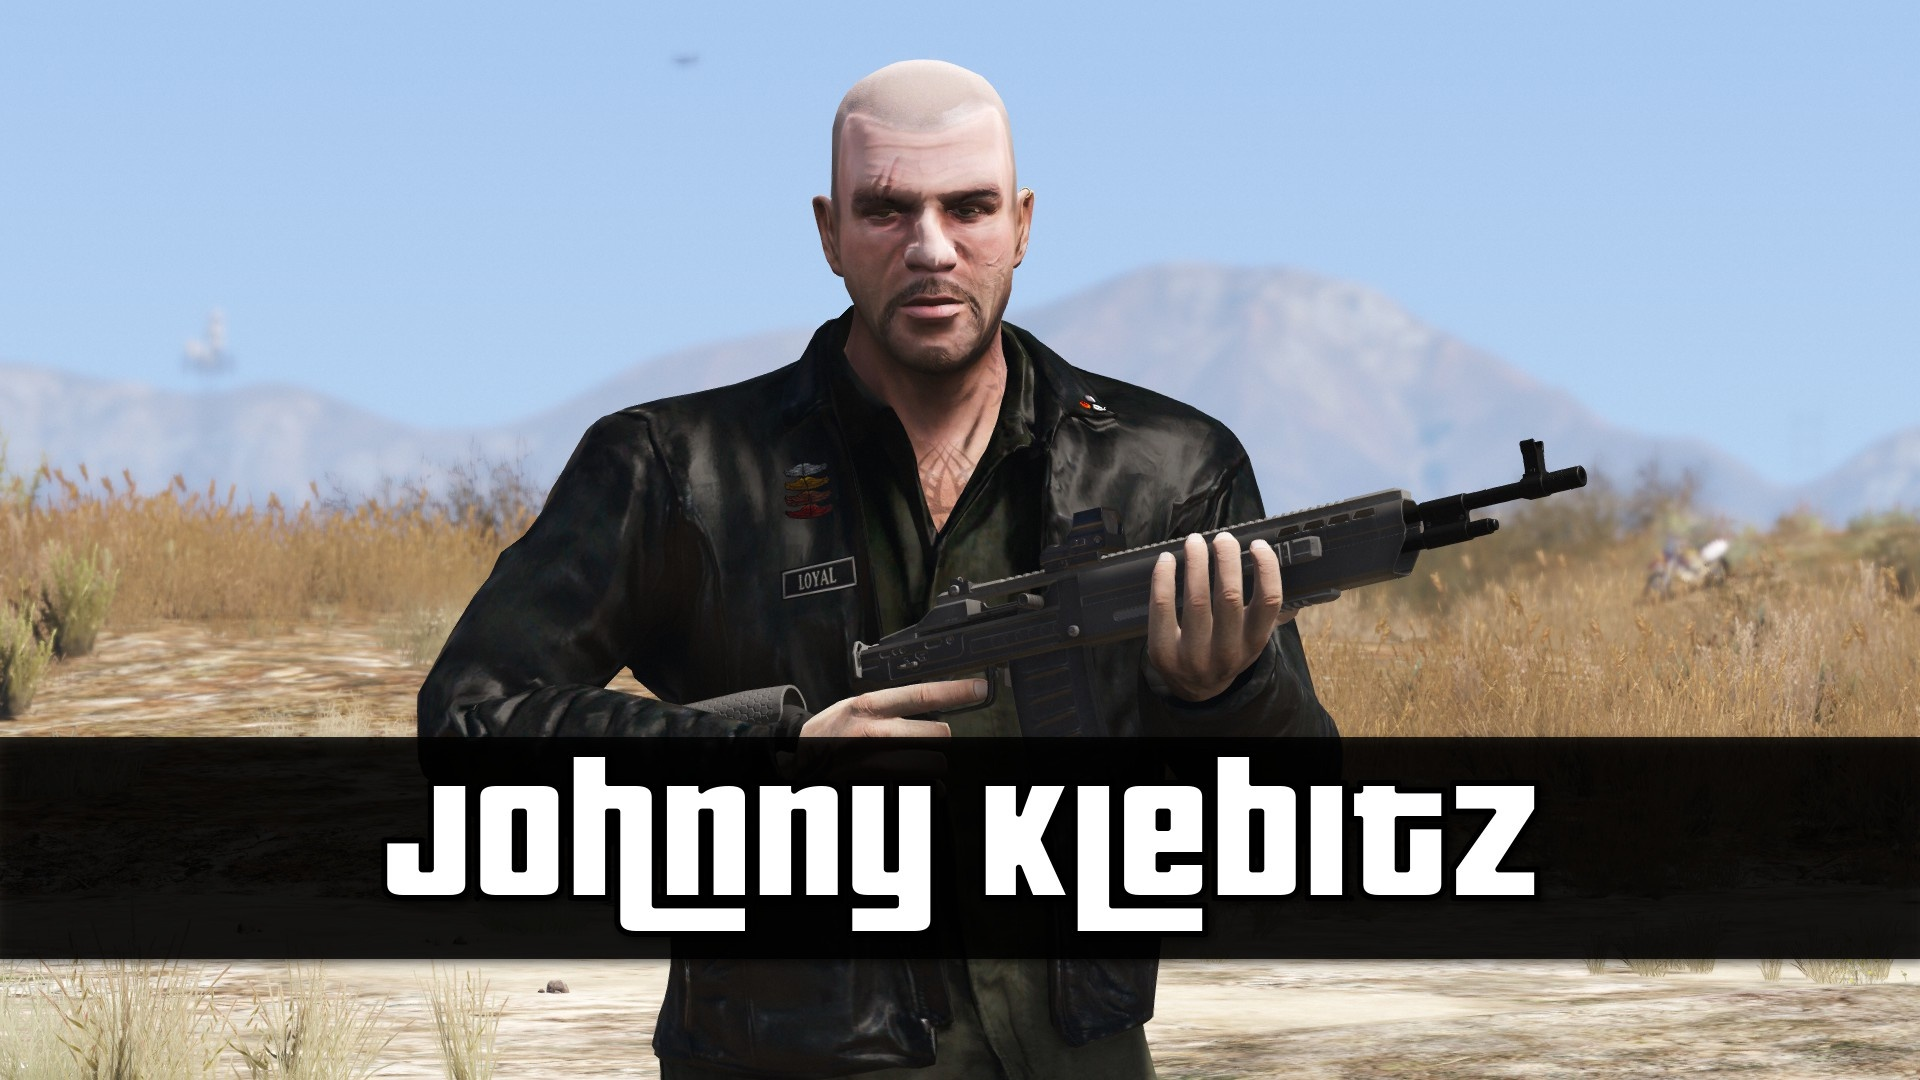 Johnny Klebitz